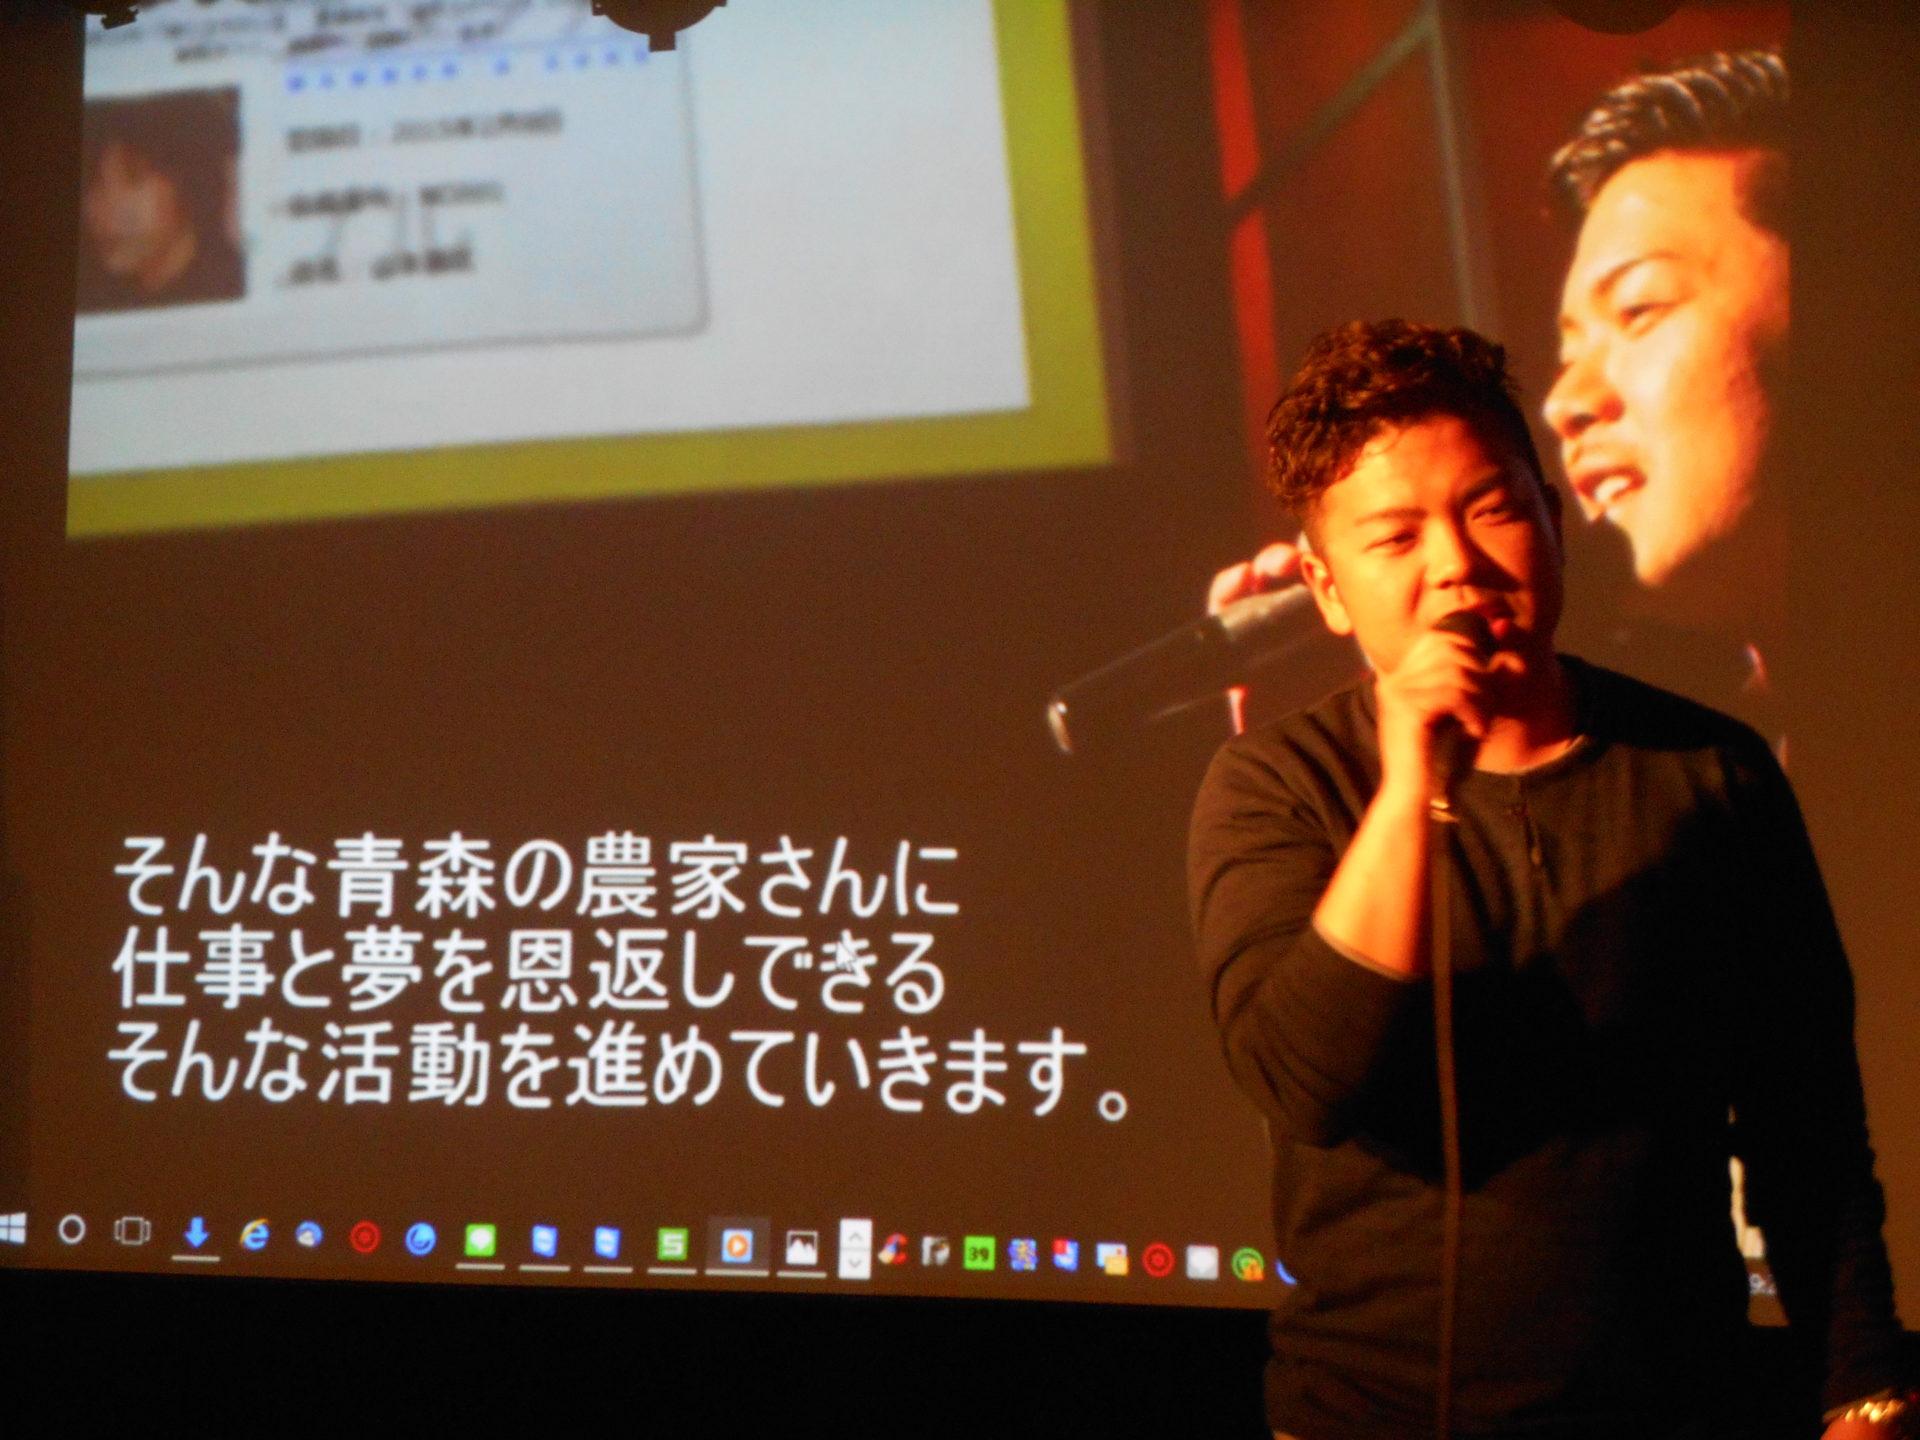 DSCN1031 1920x1440 - 2016年3月11日(金)AOsuki総会&パーティー開催しました。